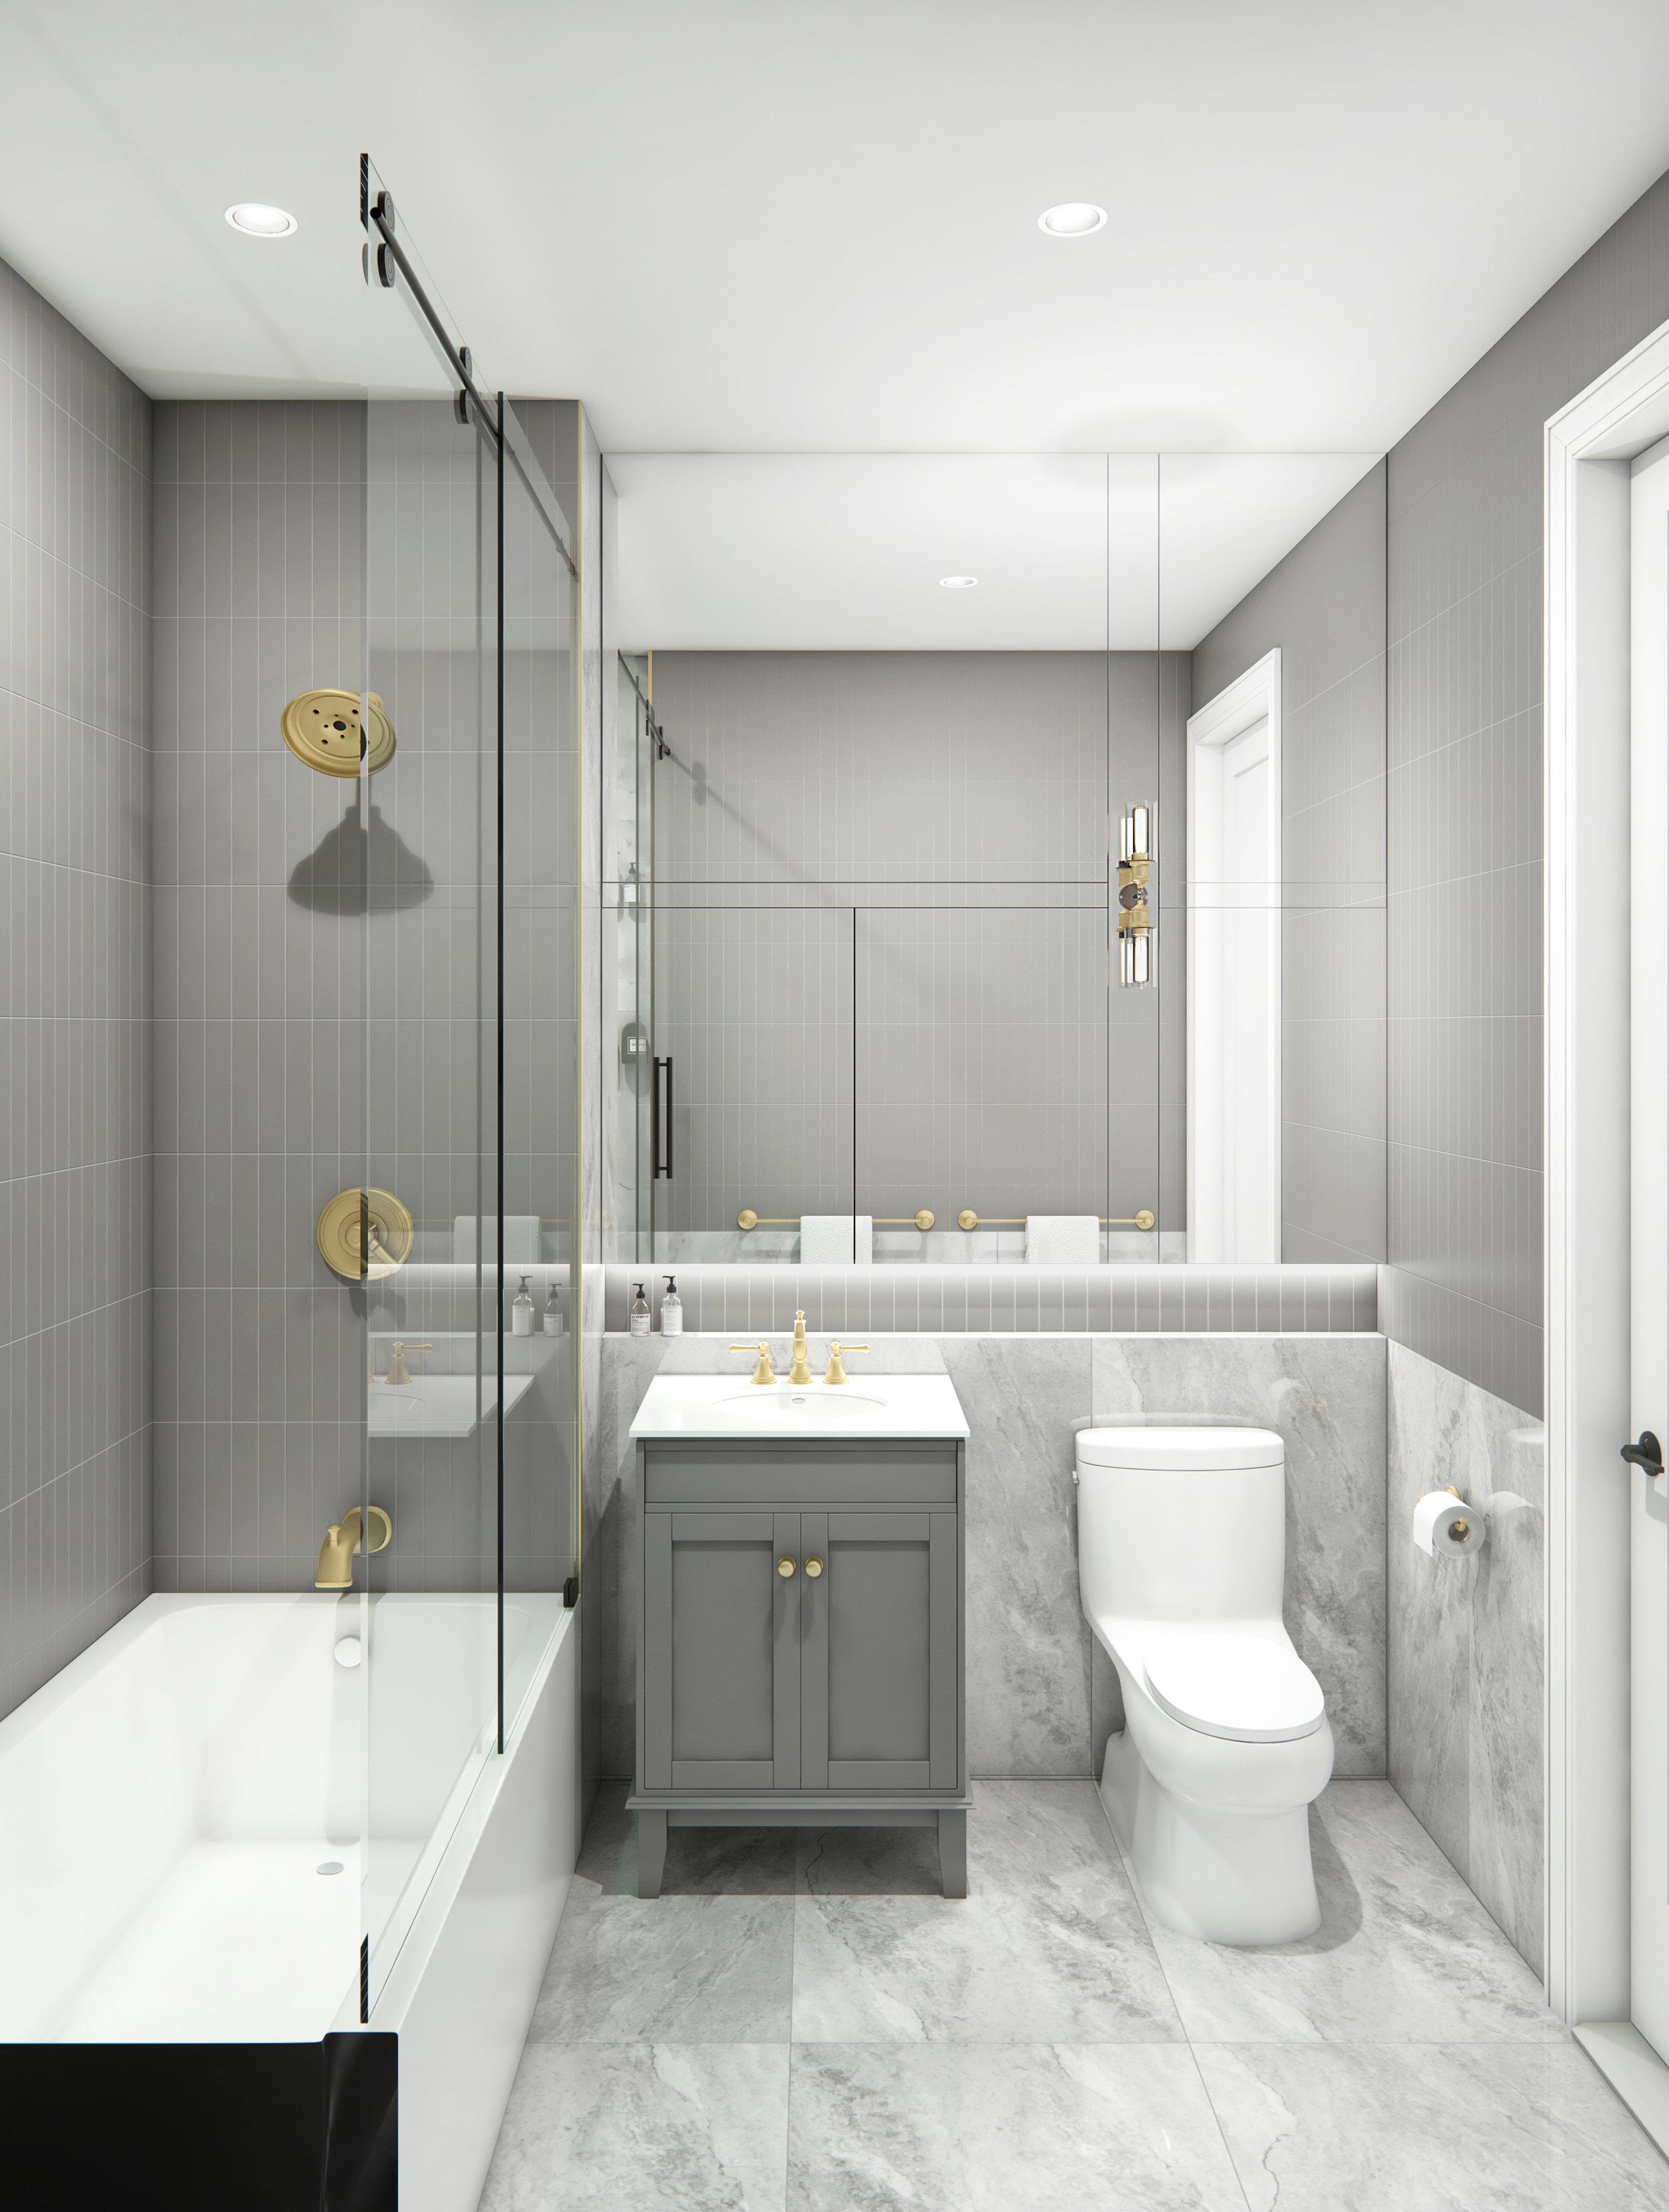 19-bathroom-bartell-010003 (3)-edit.jpg